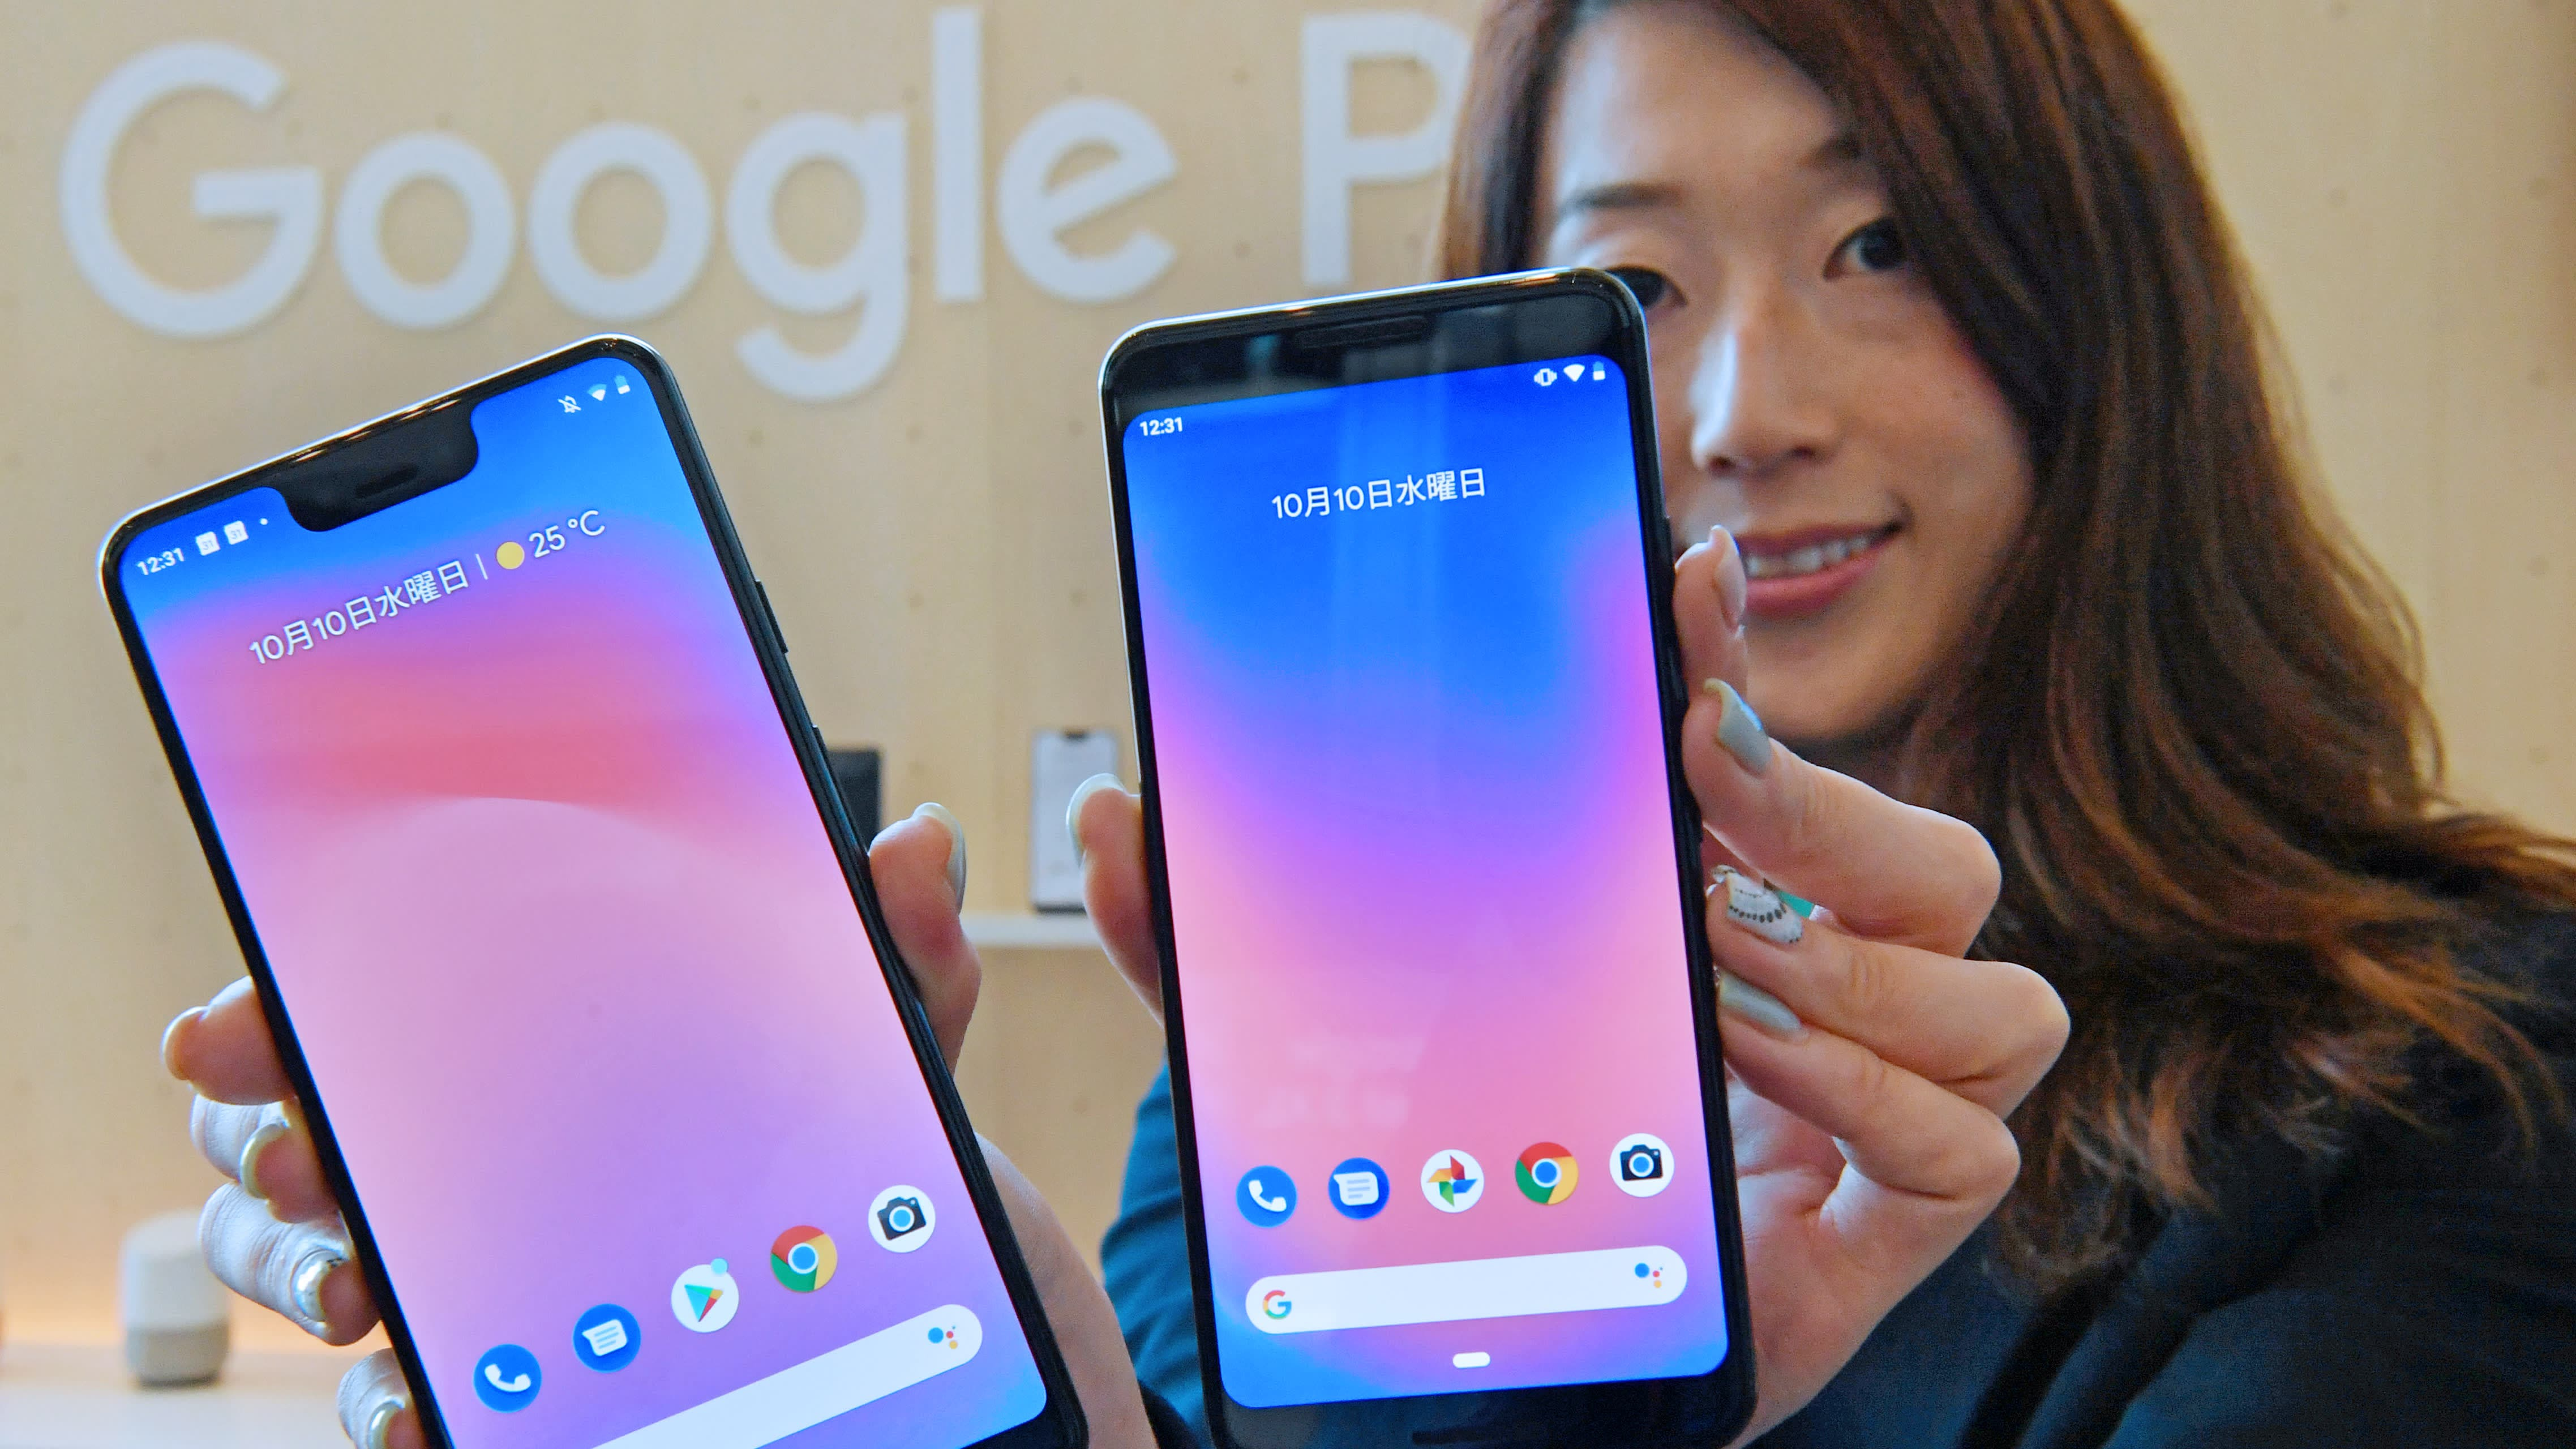 google lower-priced smartphone